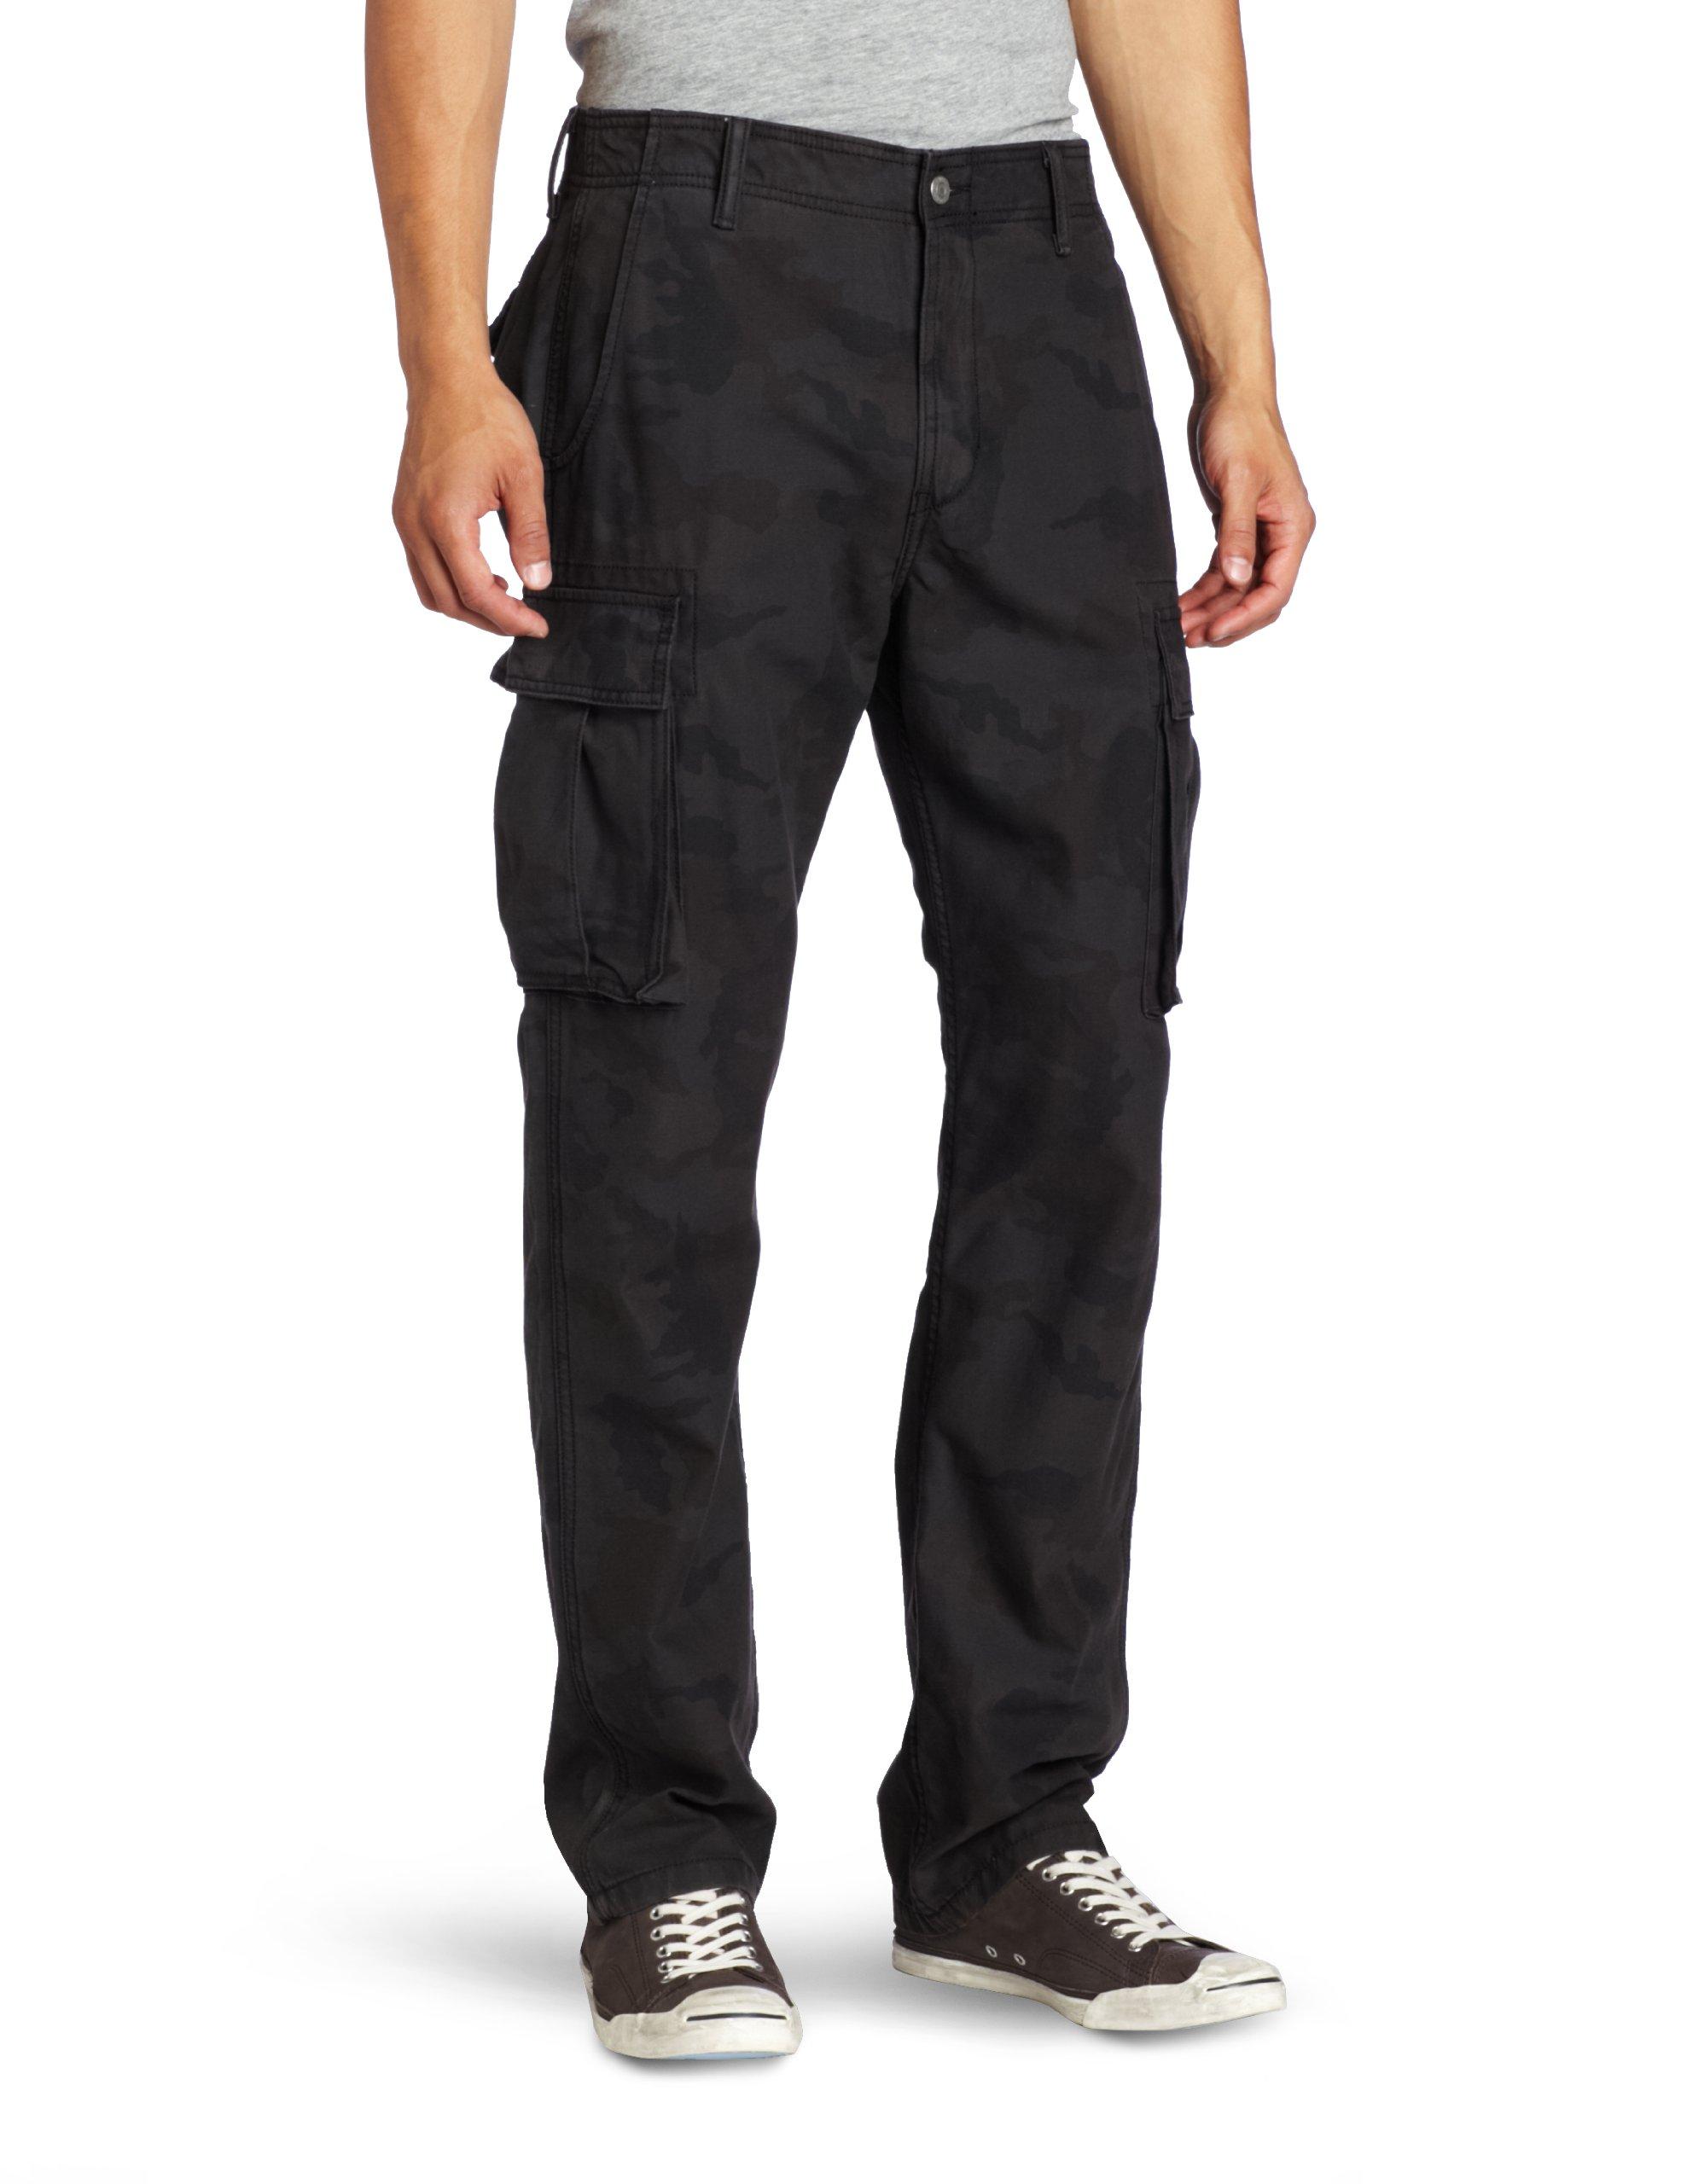 Levi's Men's 569 Loose Cargo Pant - Denim Fit